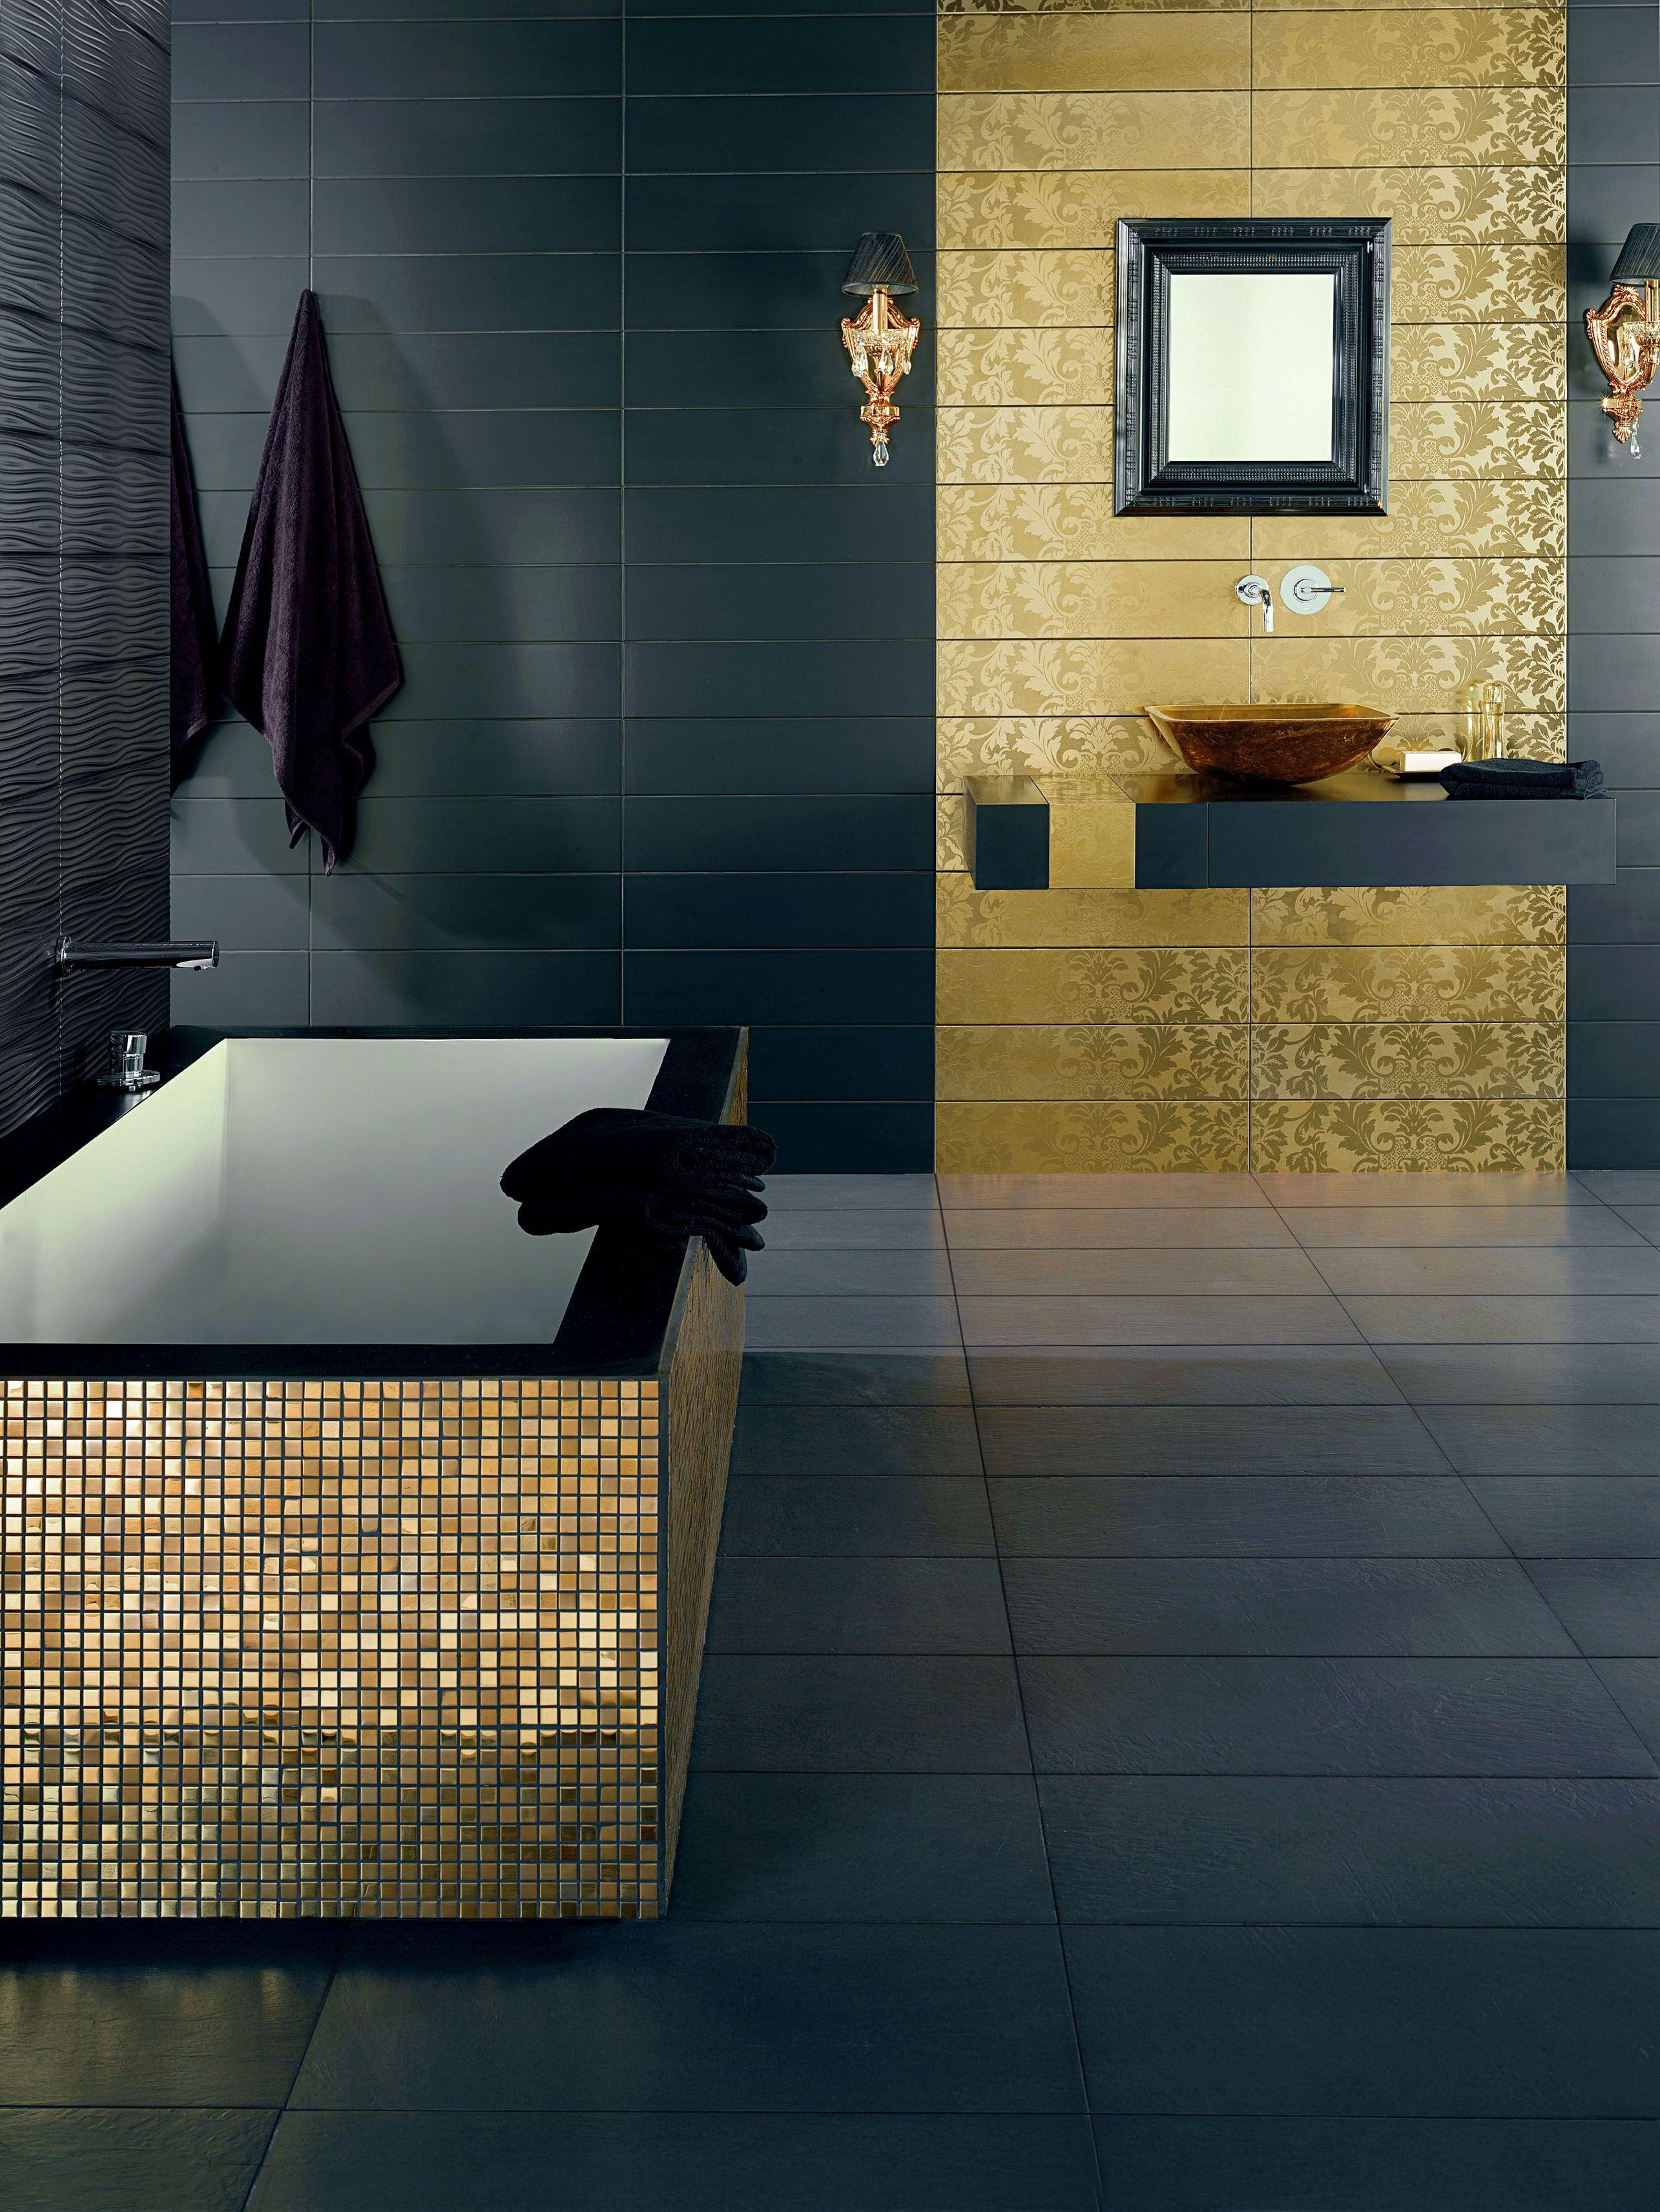 29++ Salle de bain mosaique doree ideas in 2021